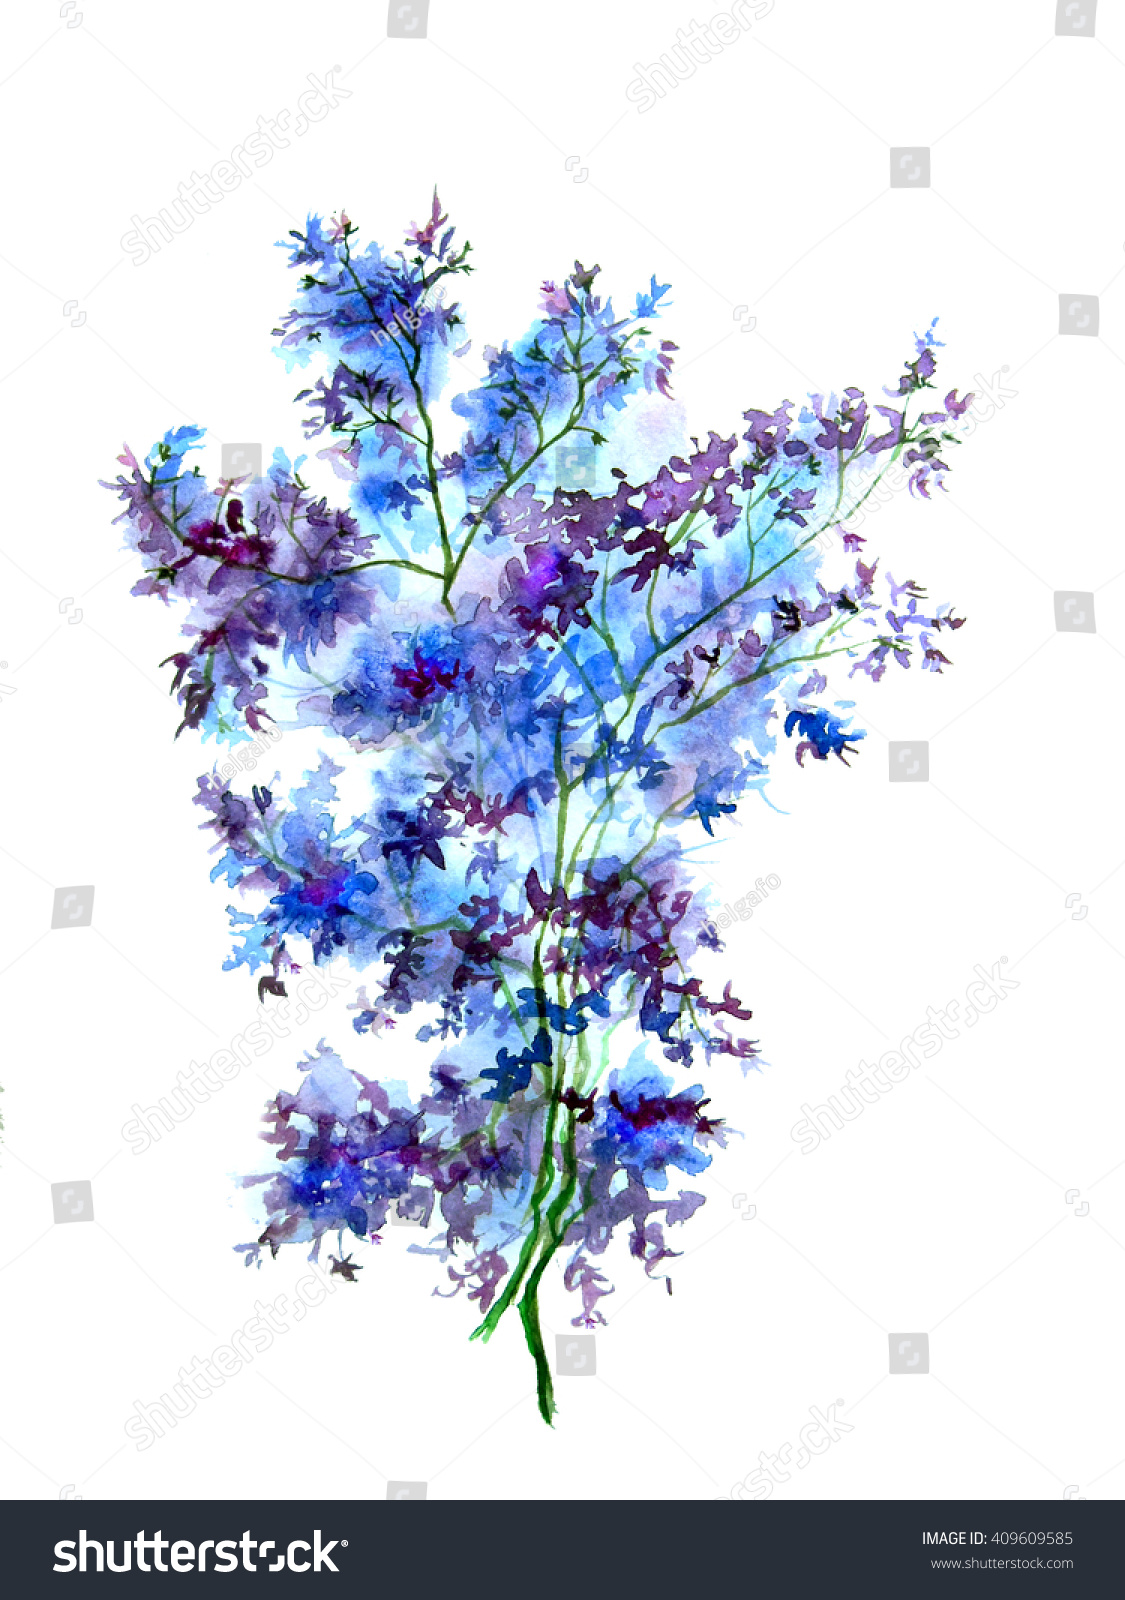 Blue Flower Field Garden Plant Watercolor Stock Illustration